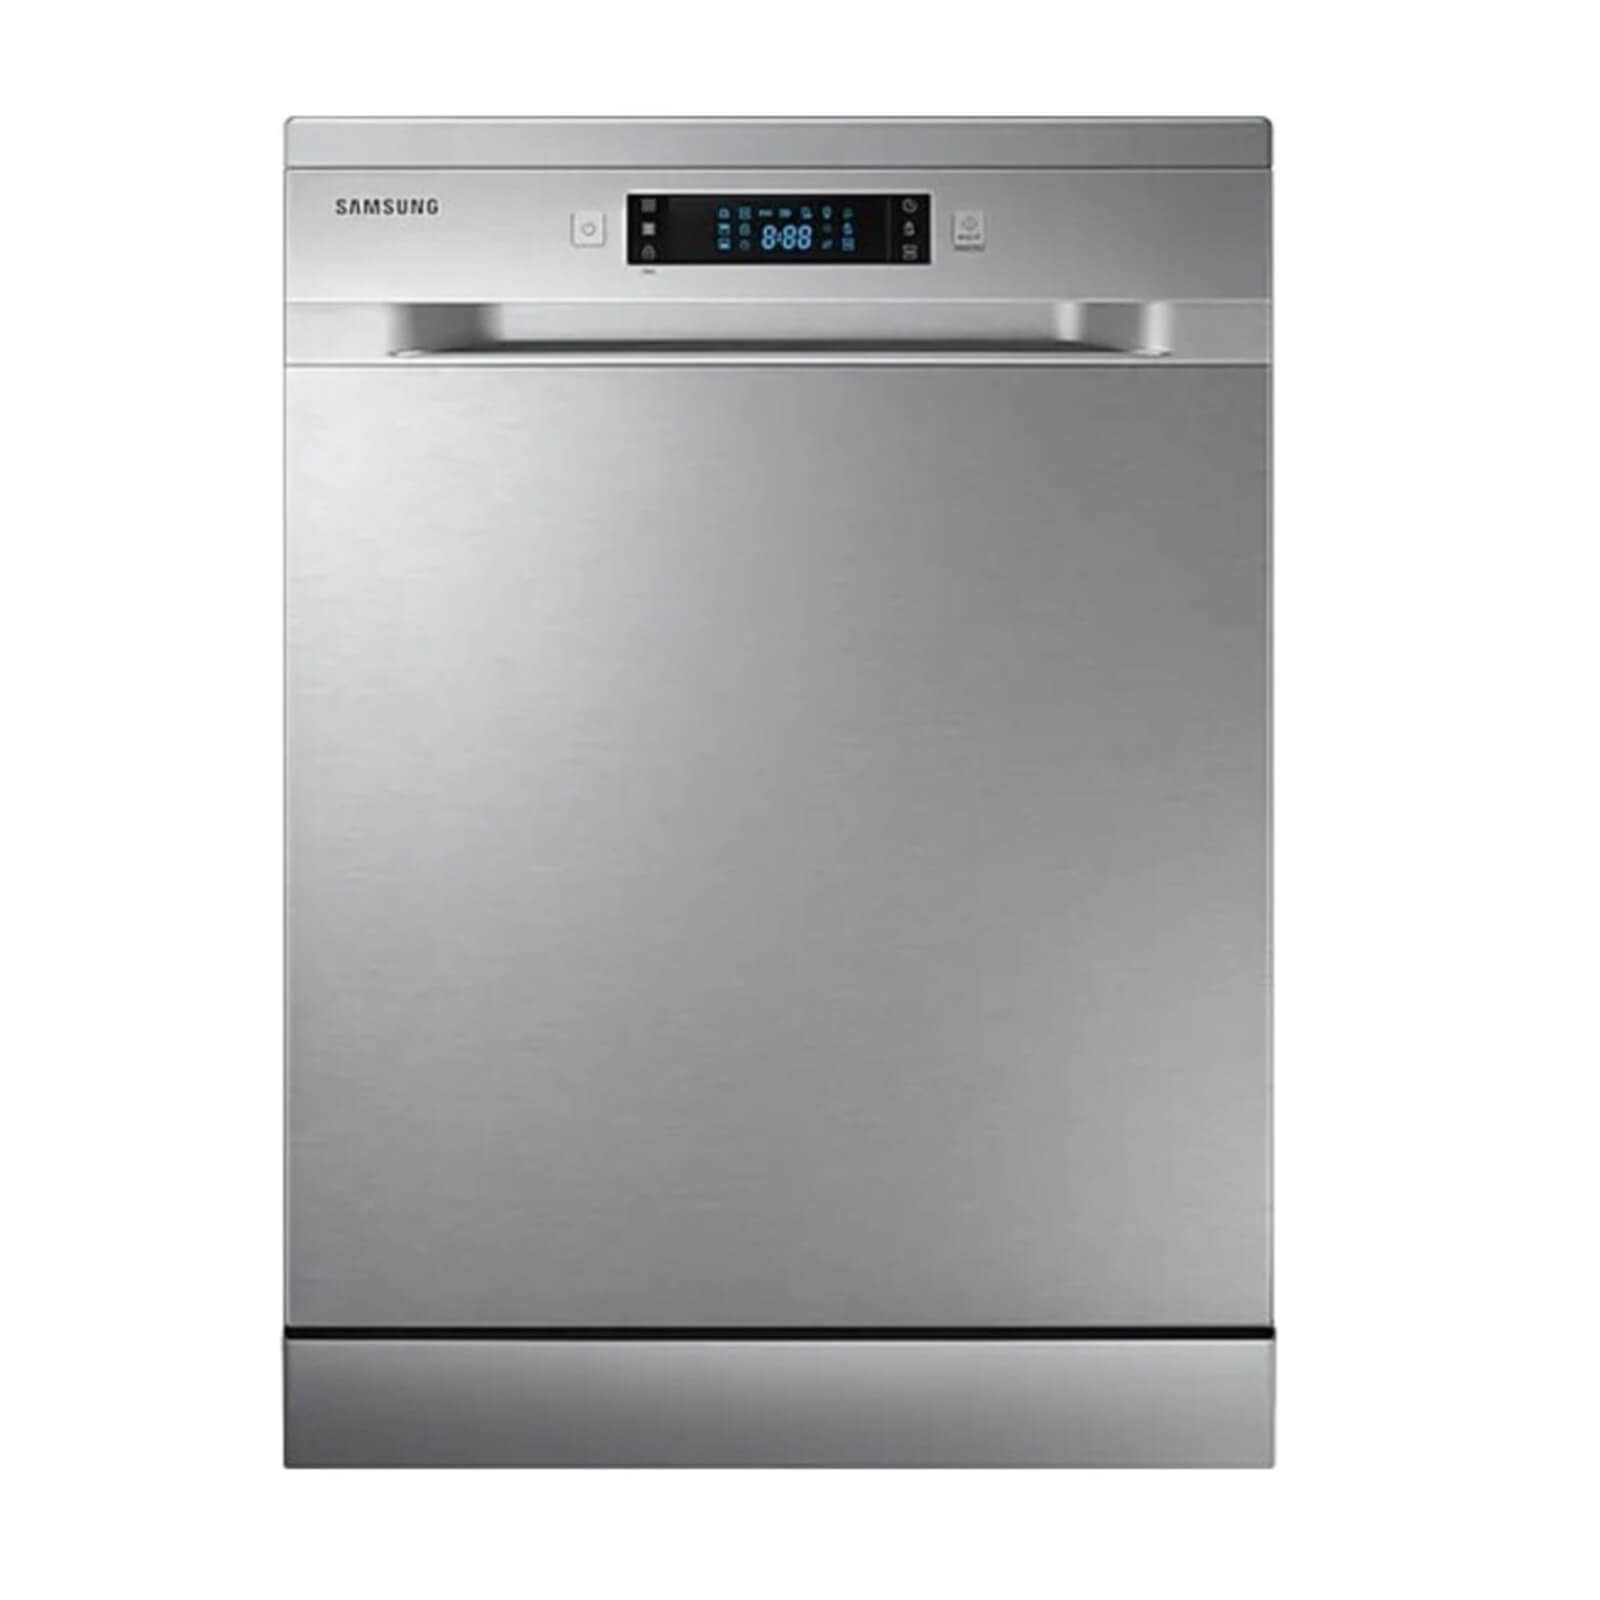 Samsung DW60M6072FS-TR Bulasik Makinesi